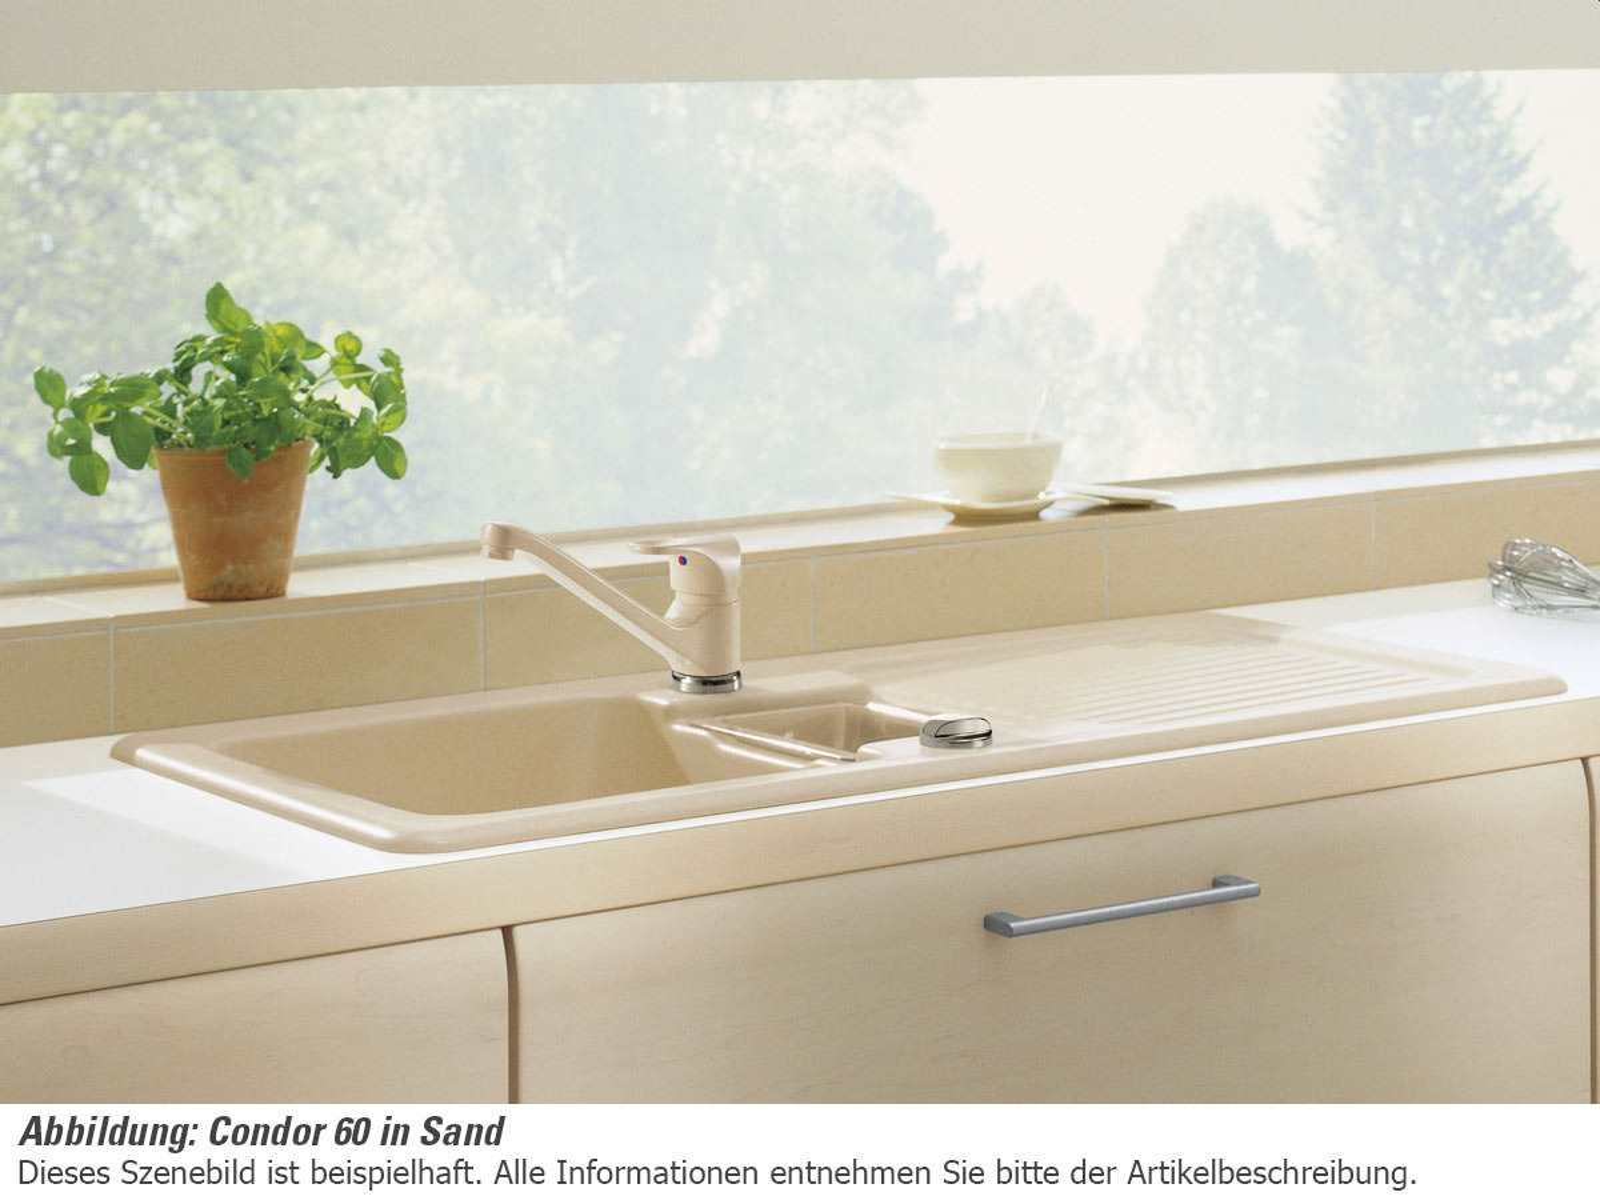 Villeroy & Boch Condor 60 Almond - 6759 02 AM Keramikspüle Exzenterbetätigung